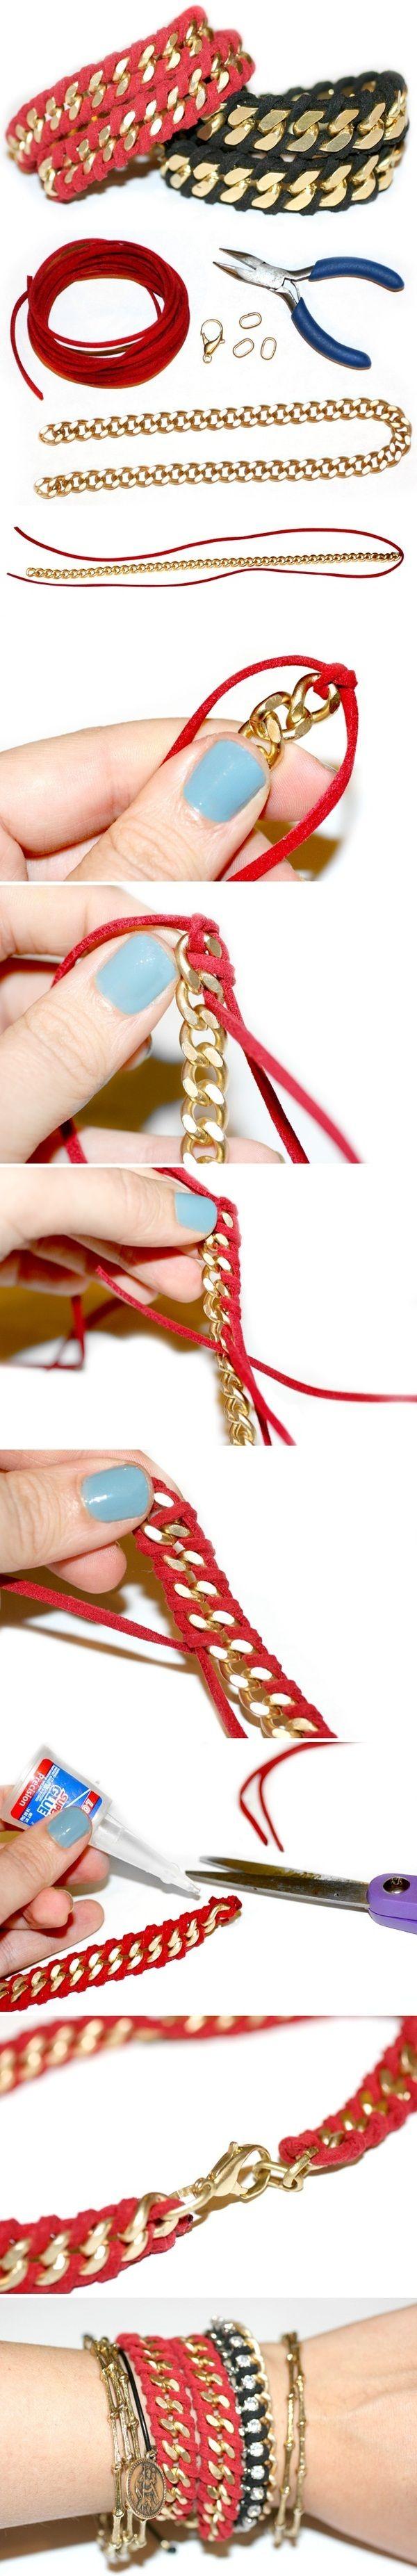 DIY bracelet: Ideas, Chain Bracelets, Diy'S, Diy Jewelry, Diy Bracelets, Diy Craft